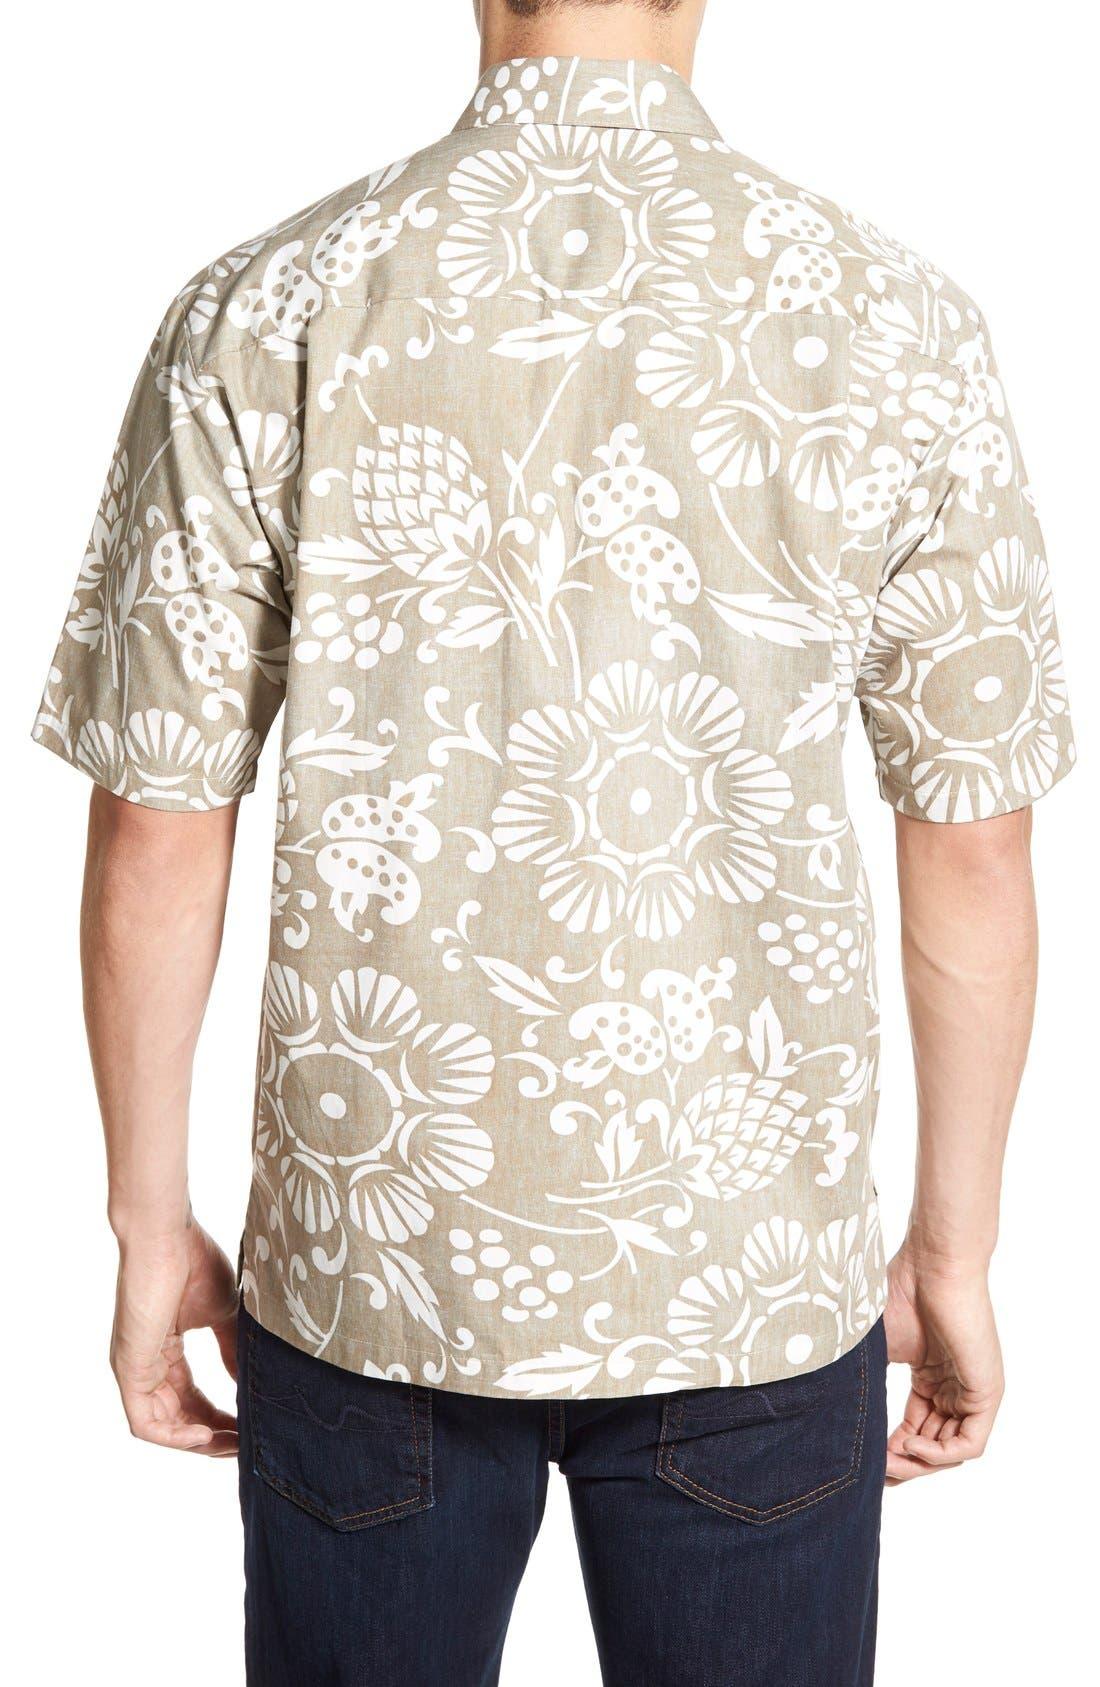 'Dukes Par' Regular Fit Sport Shirt,                             Alternate thumbnail 10, color,                             210